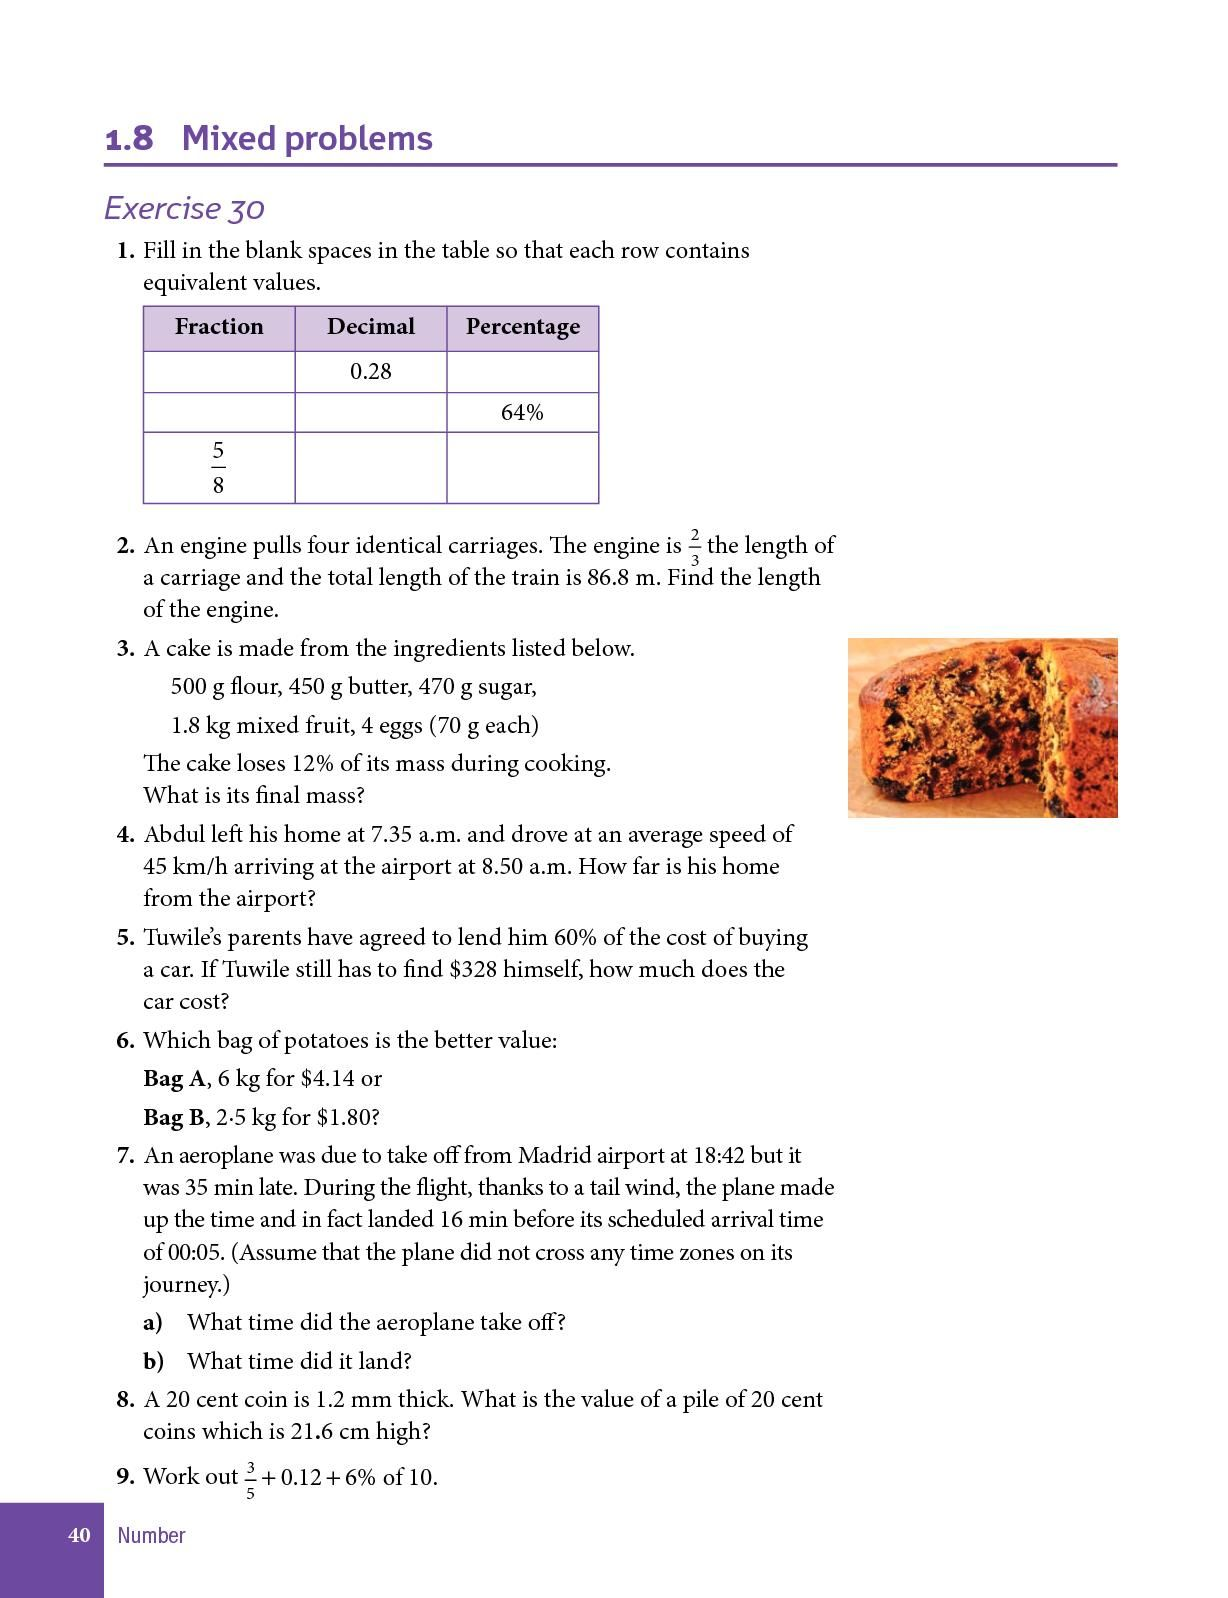 Pdf Print Complete Mathematics For Cambridge Igcse Fifth Edition Extended Cambridge Igcse Mathematics Igcse Maths Additional mathematics textbook pdf